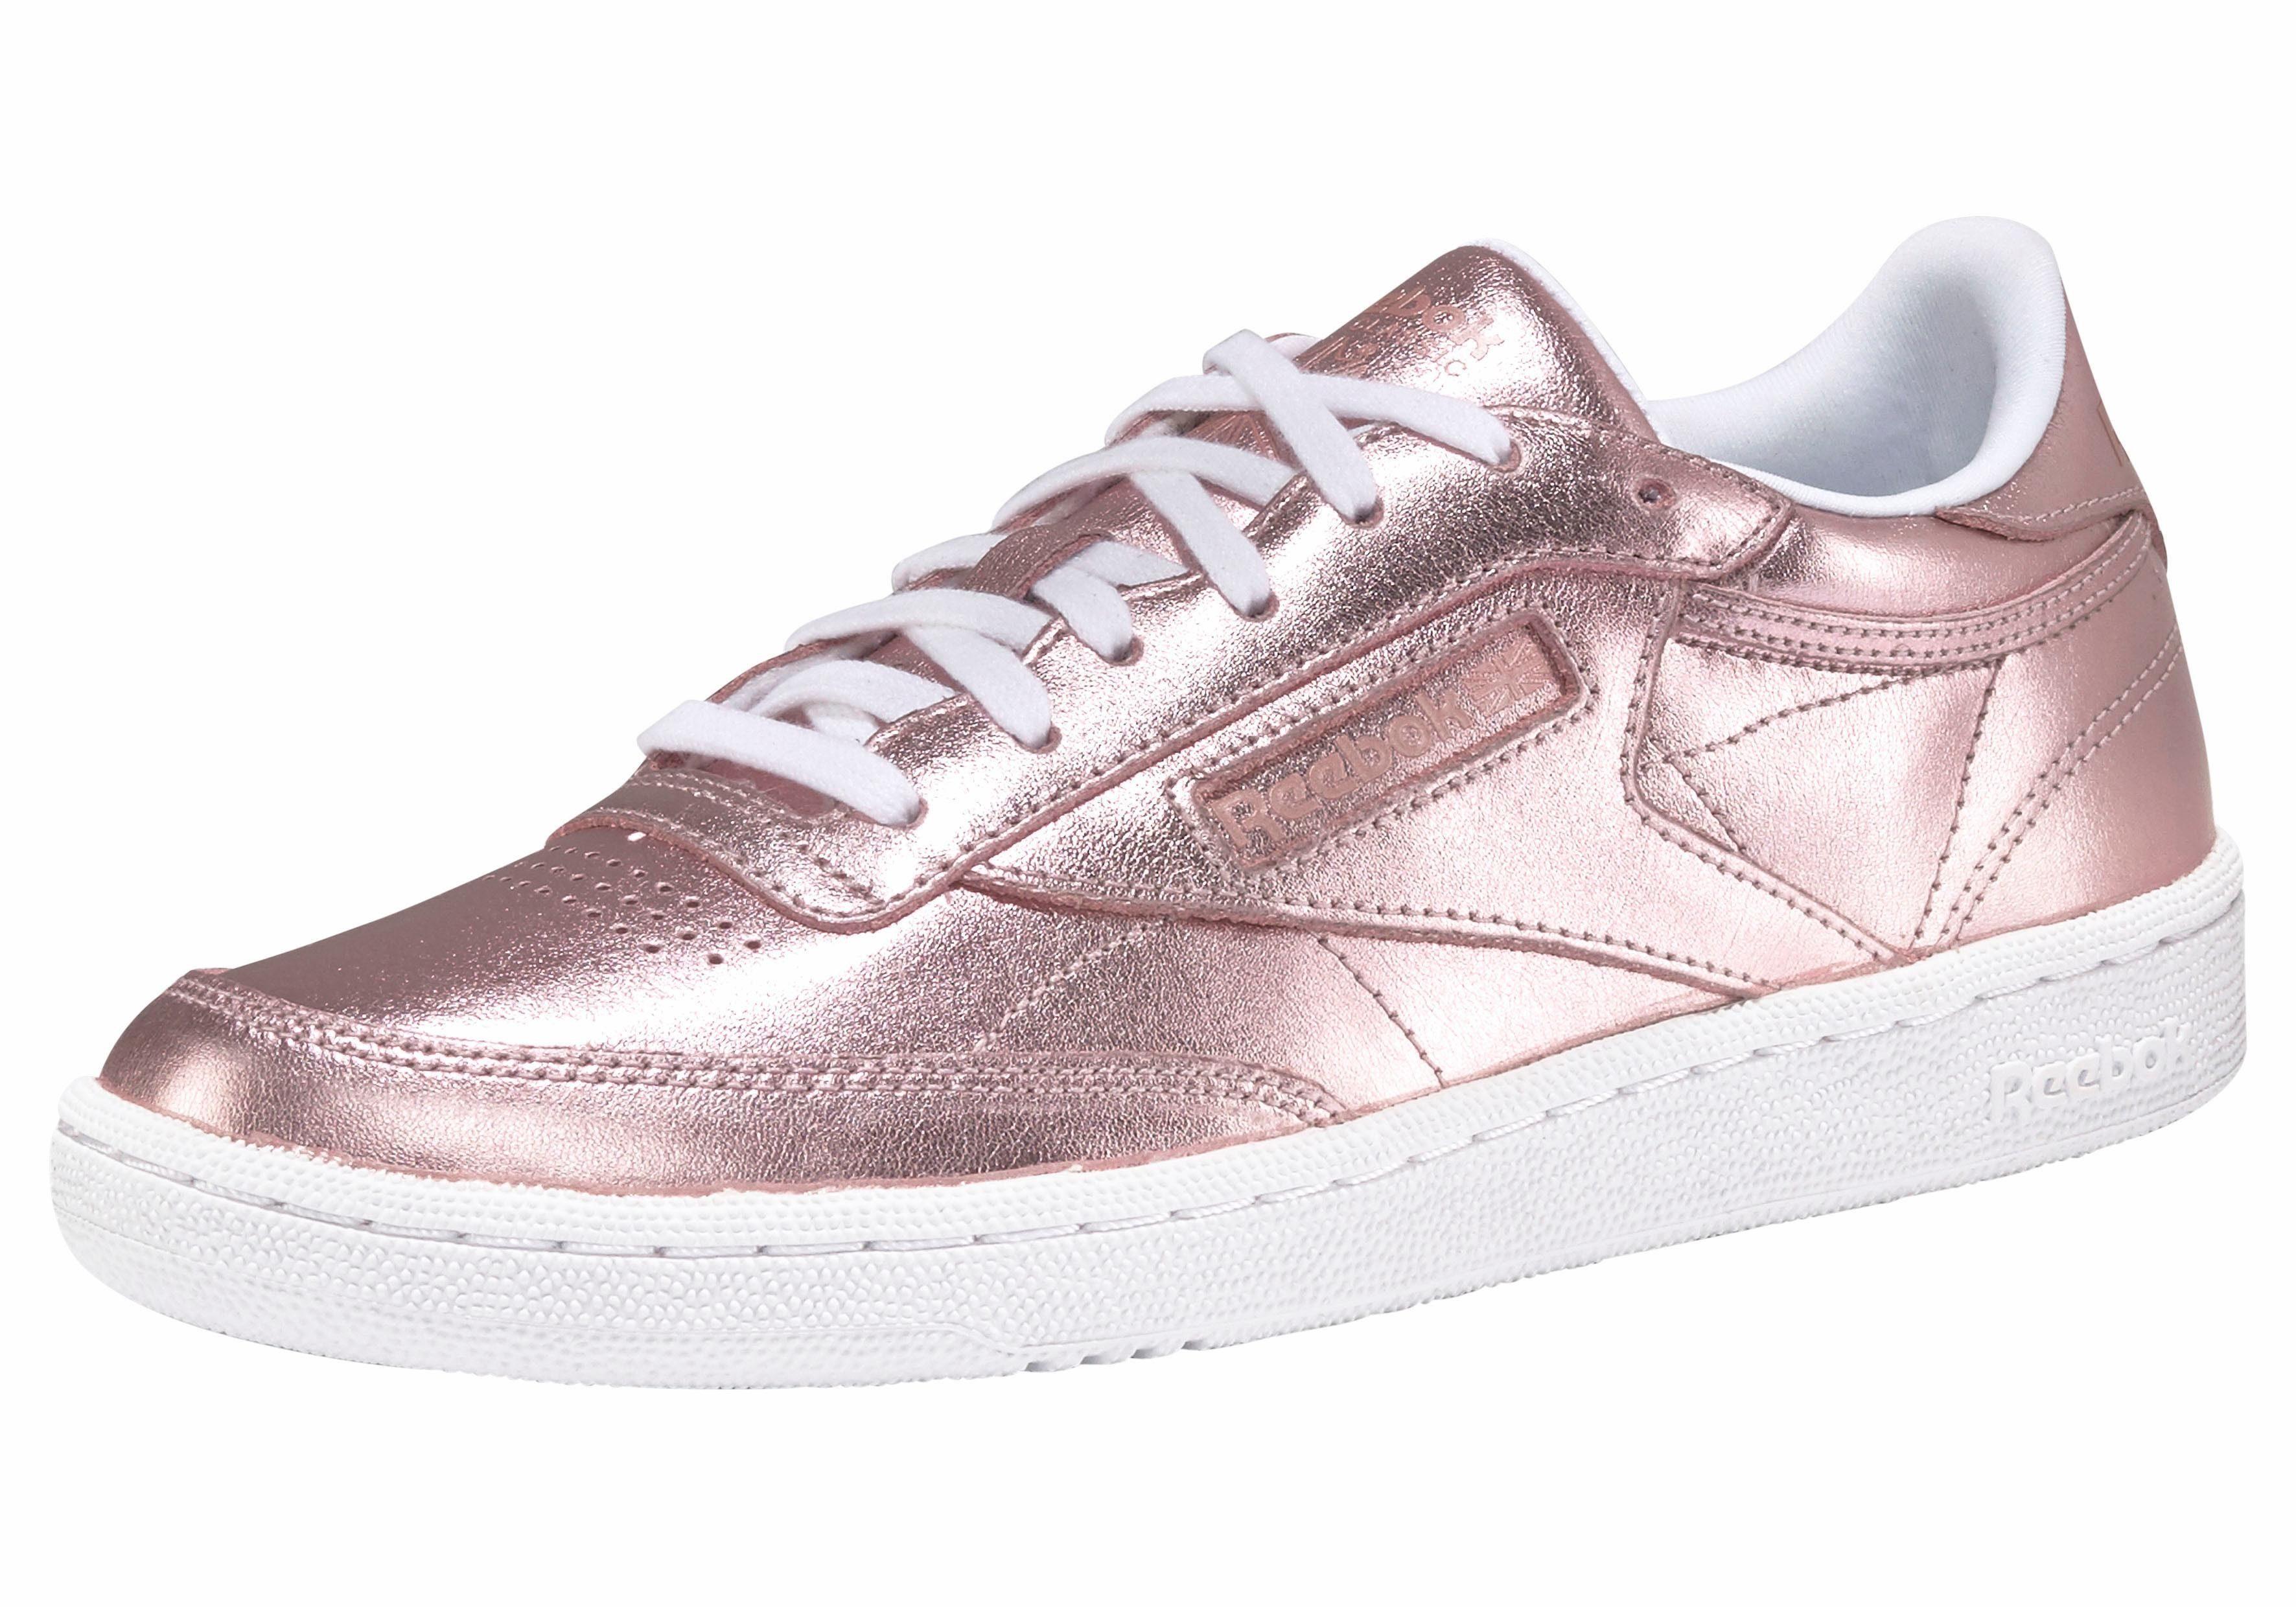 85 C »club Reebok Classic KaufenOtto Sneaker Shine« A4cRq5L3j